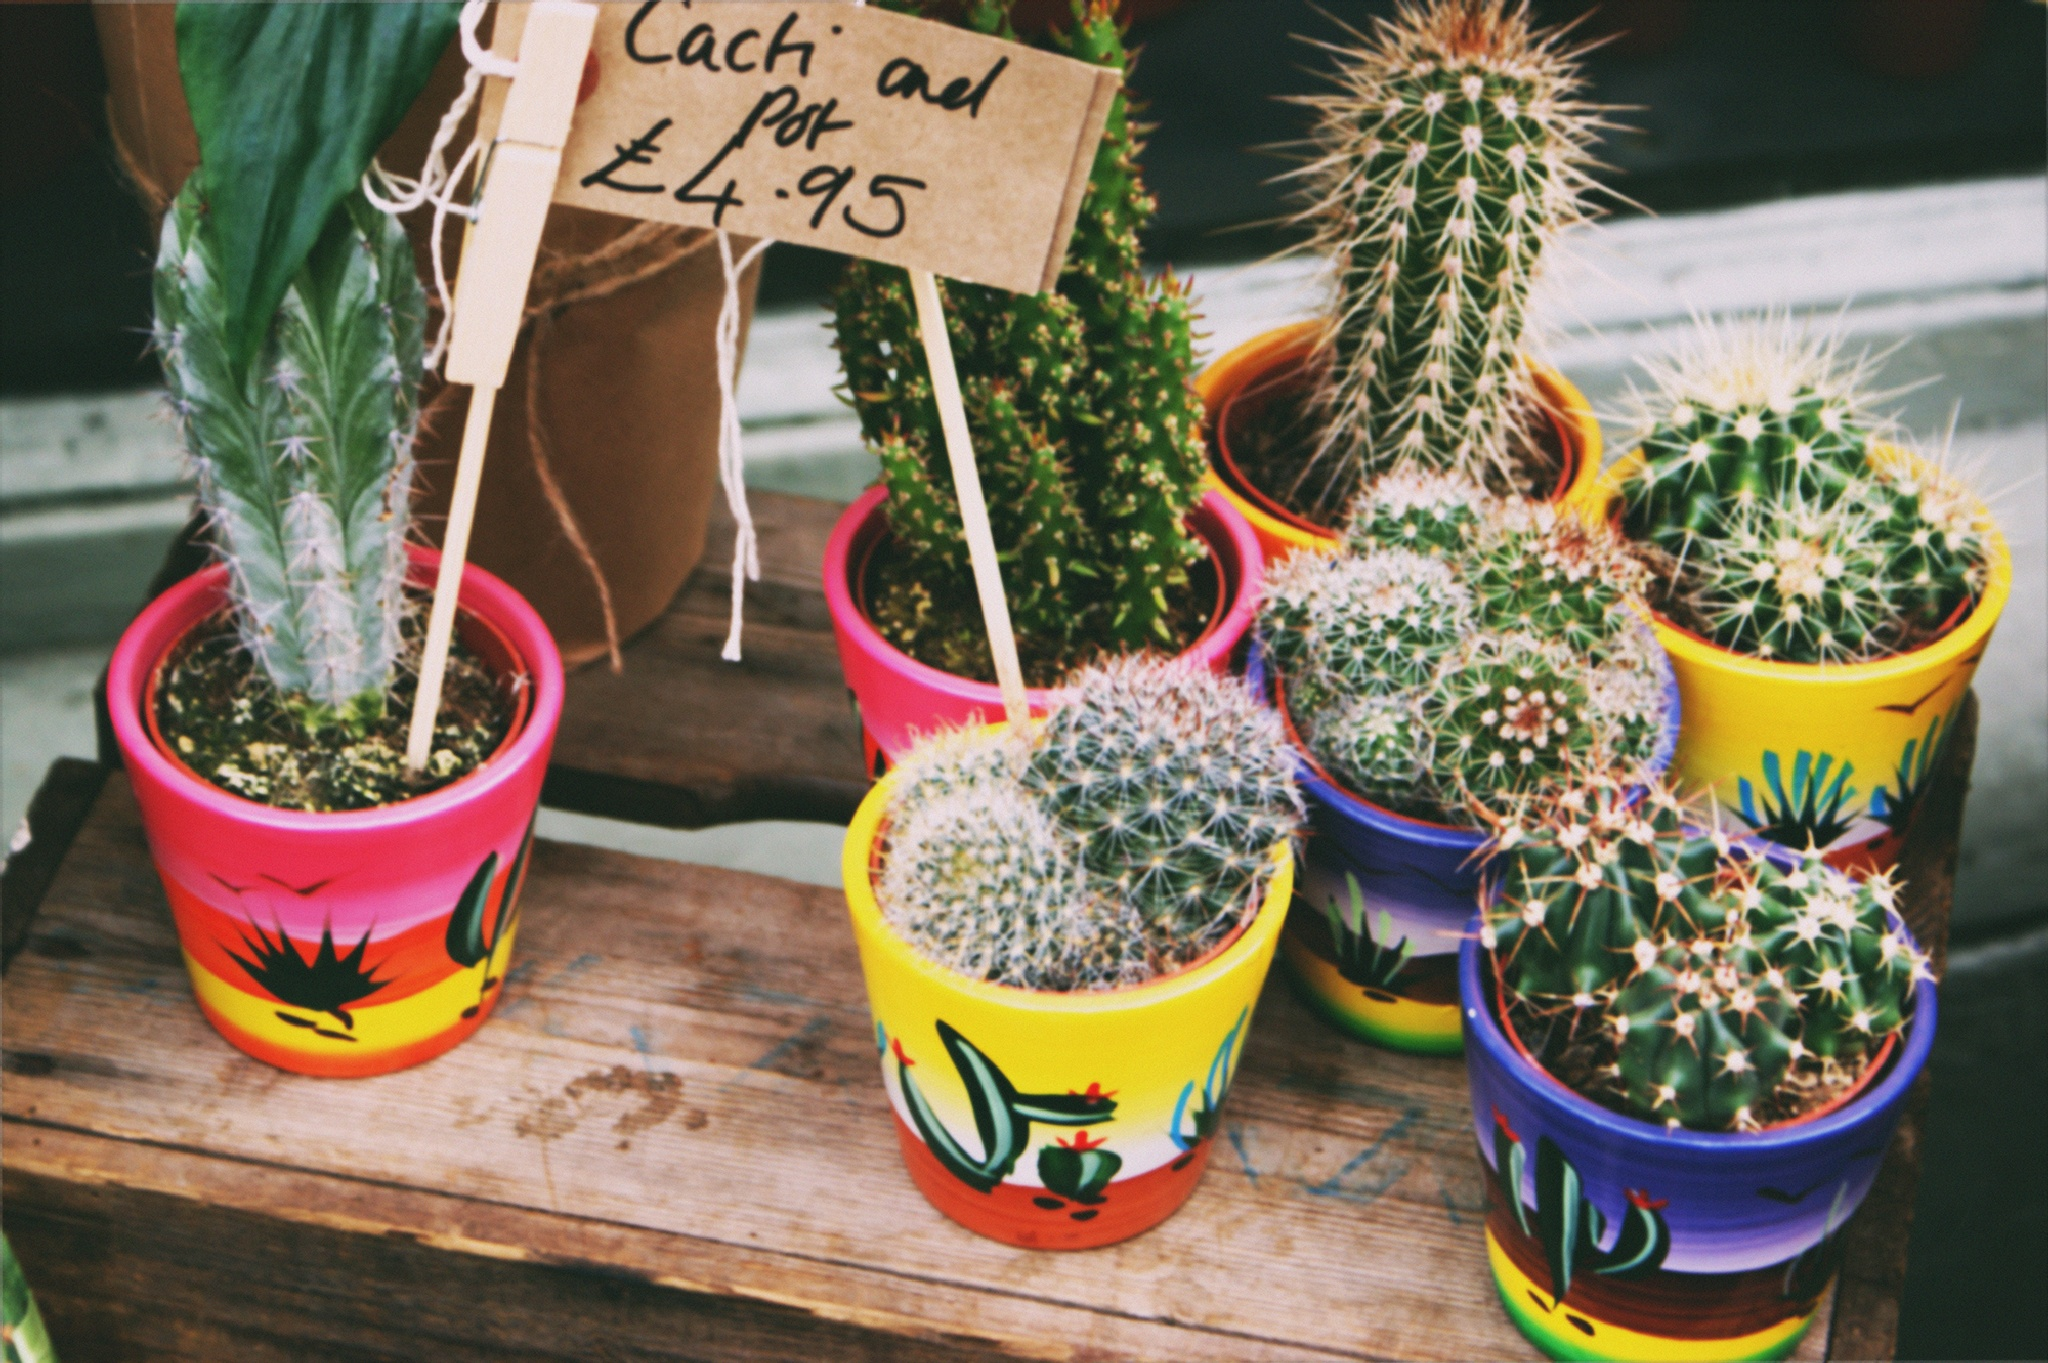 Cactus by Tashhaaaj